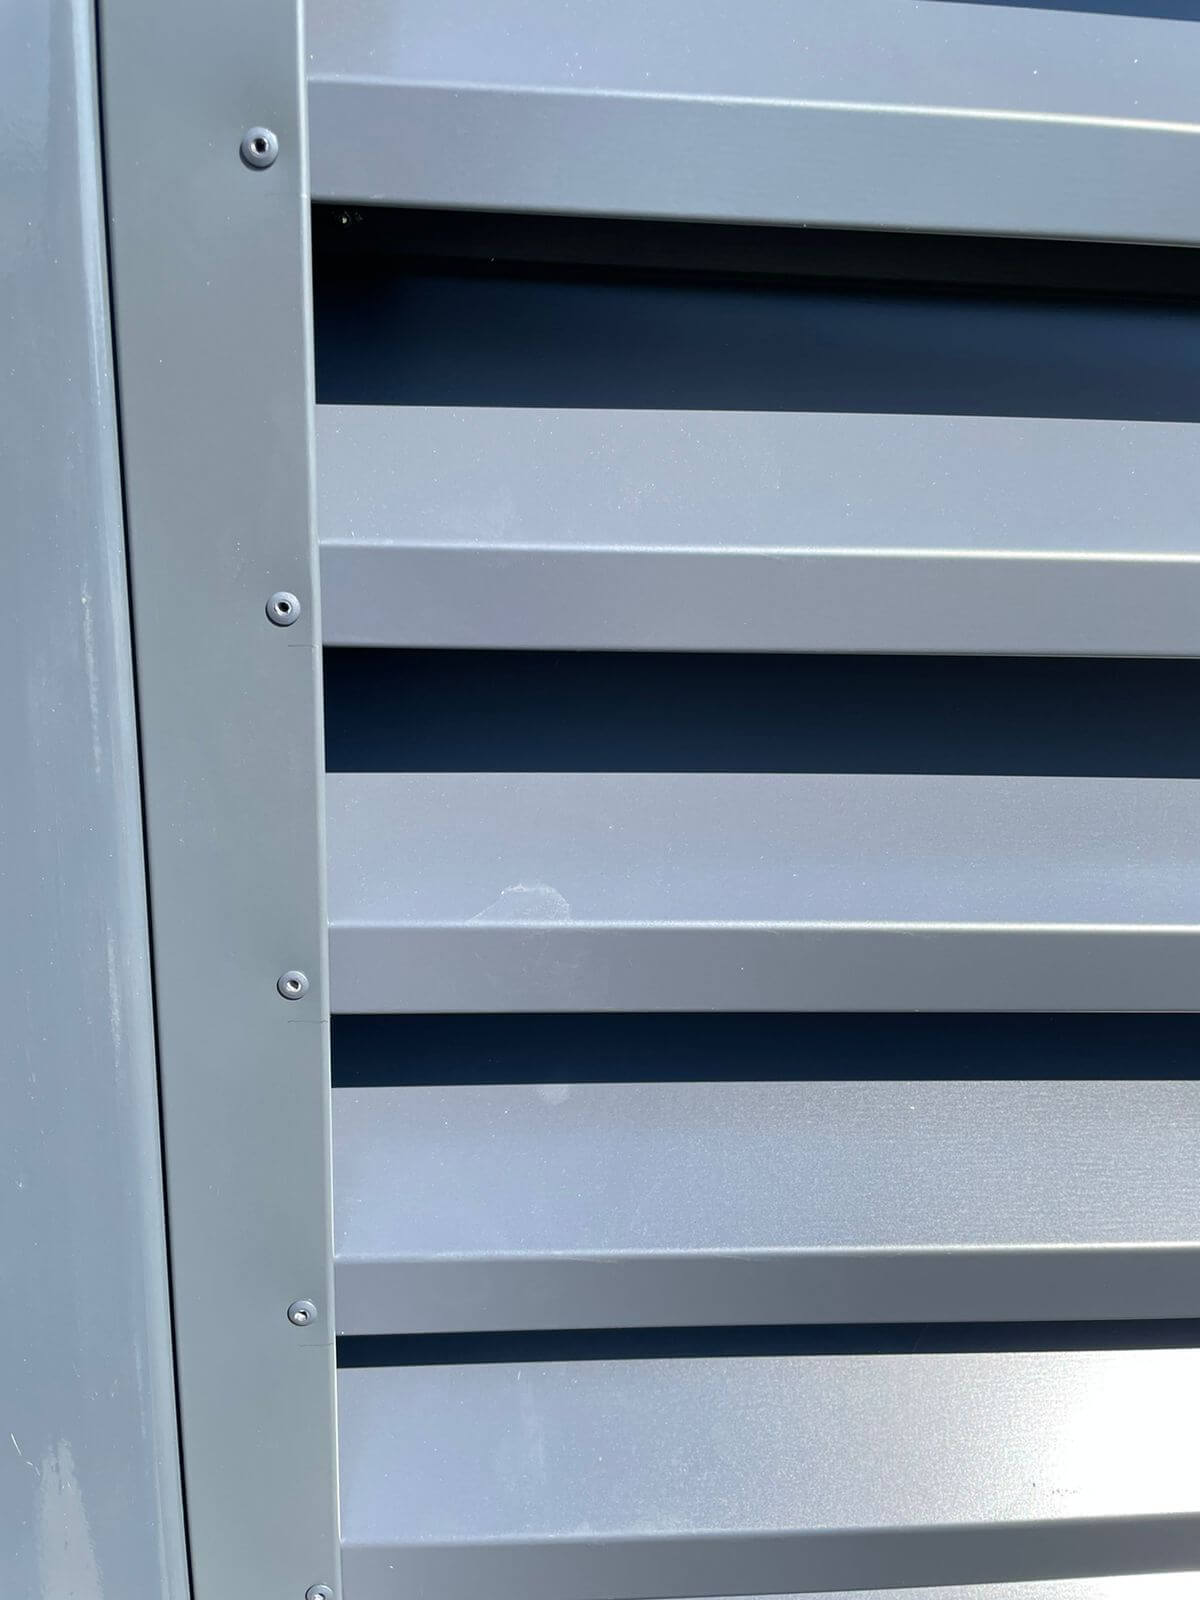 забор-жалюзи с ламелями эко-z ral7024/7024 серый графит двухсторонний фото5